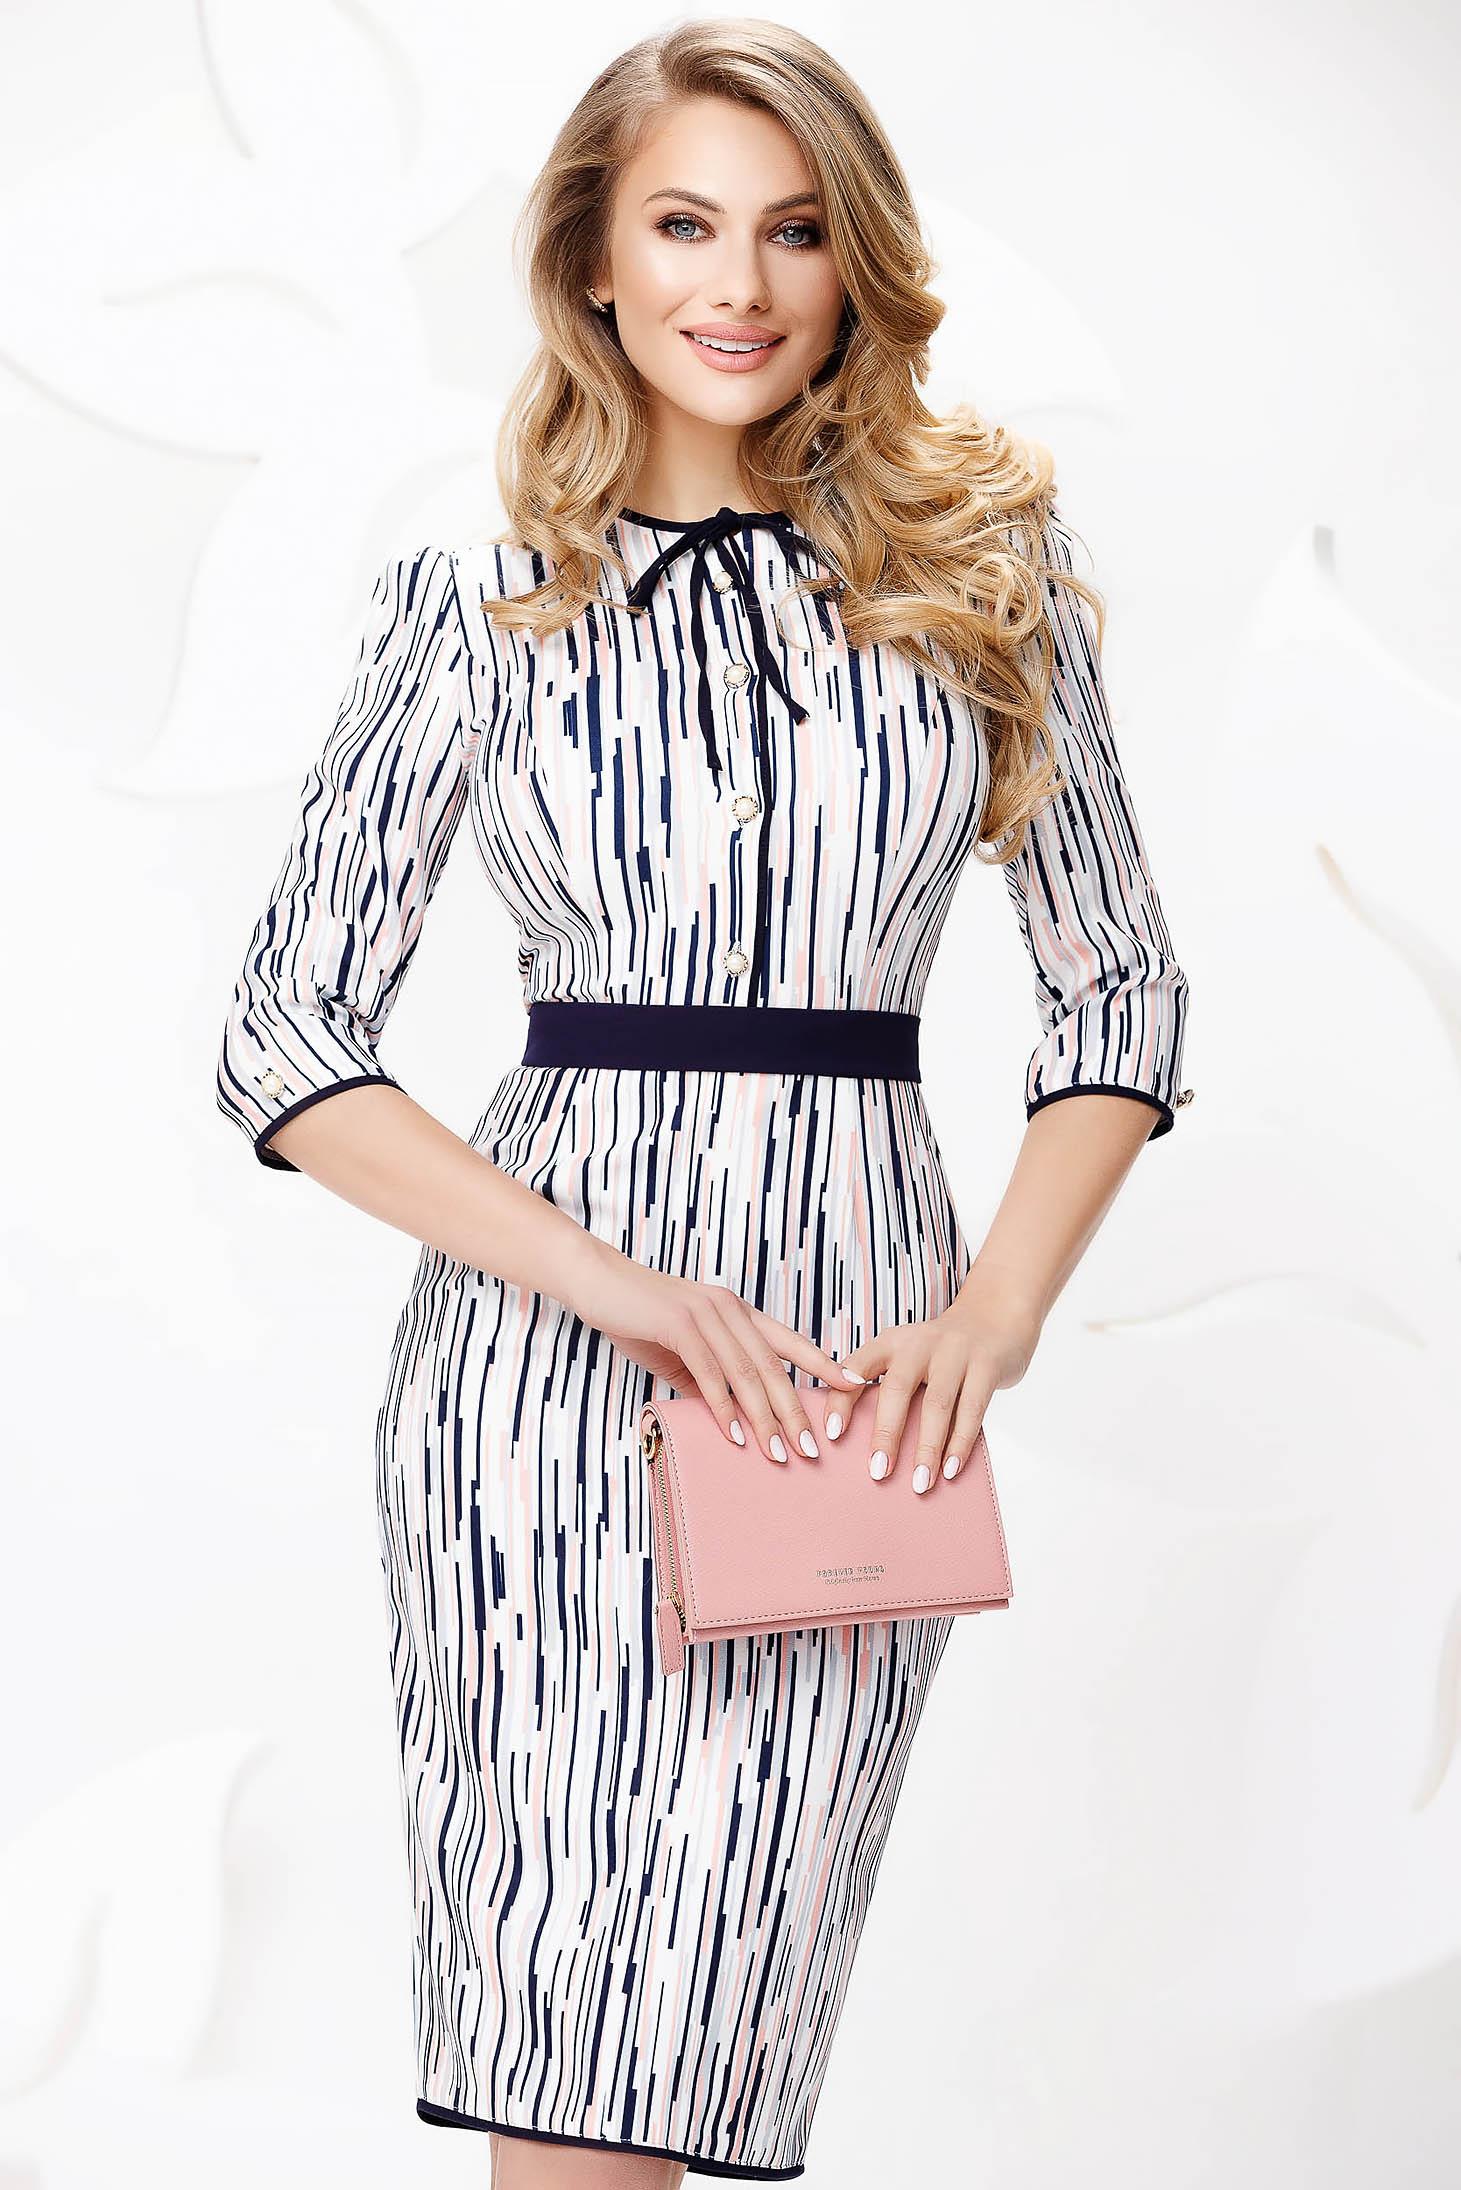 Lightpink dress elegant midi pencil thin fabric with bow accessories